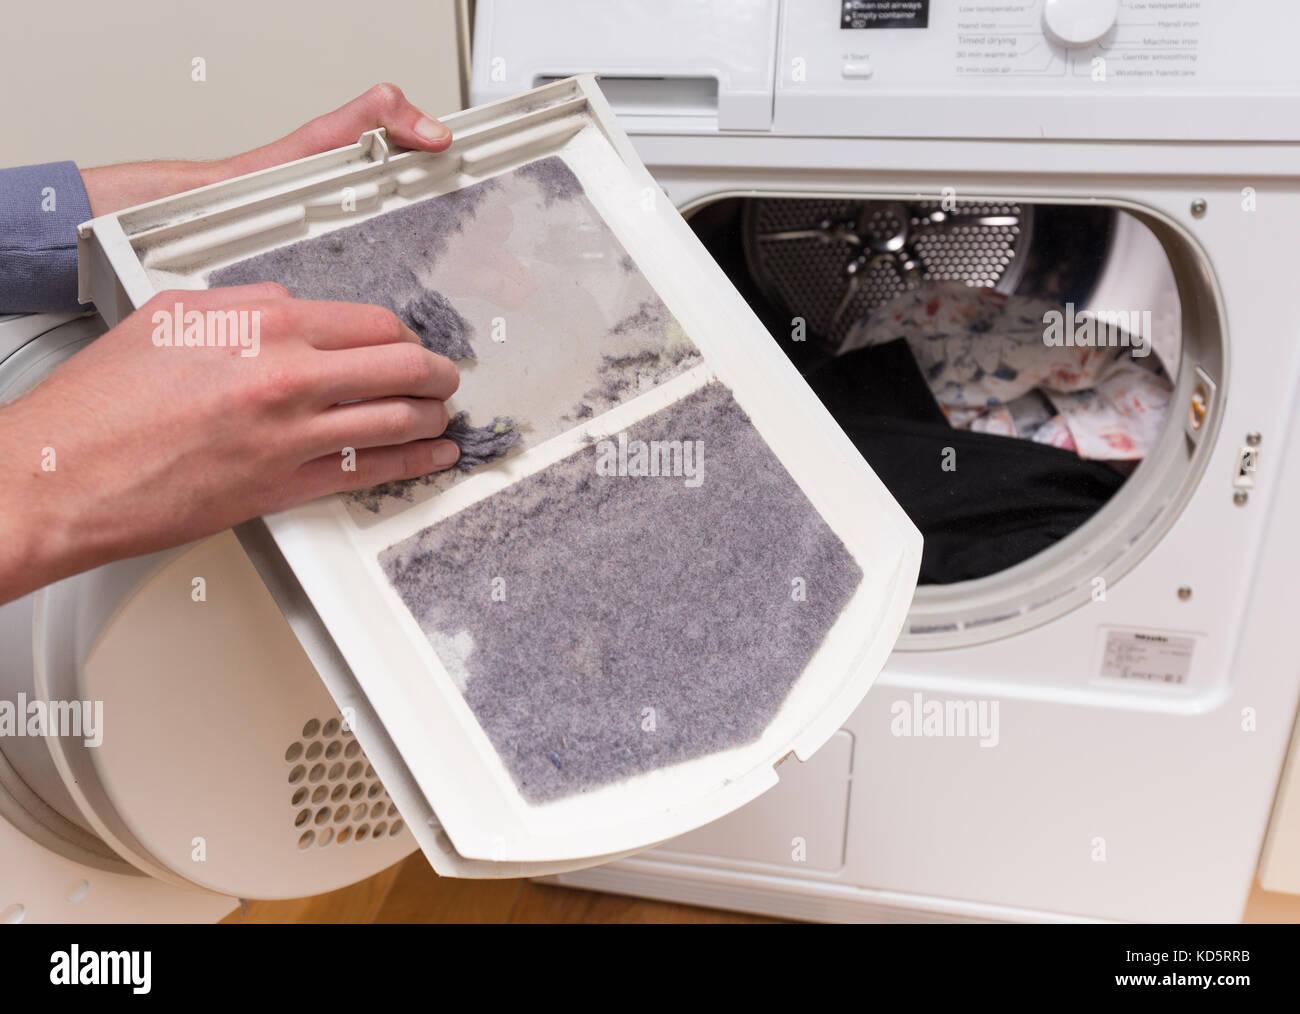 Tumble Dryer Filter ~ Tumble dryer stock photos images alamy